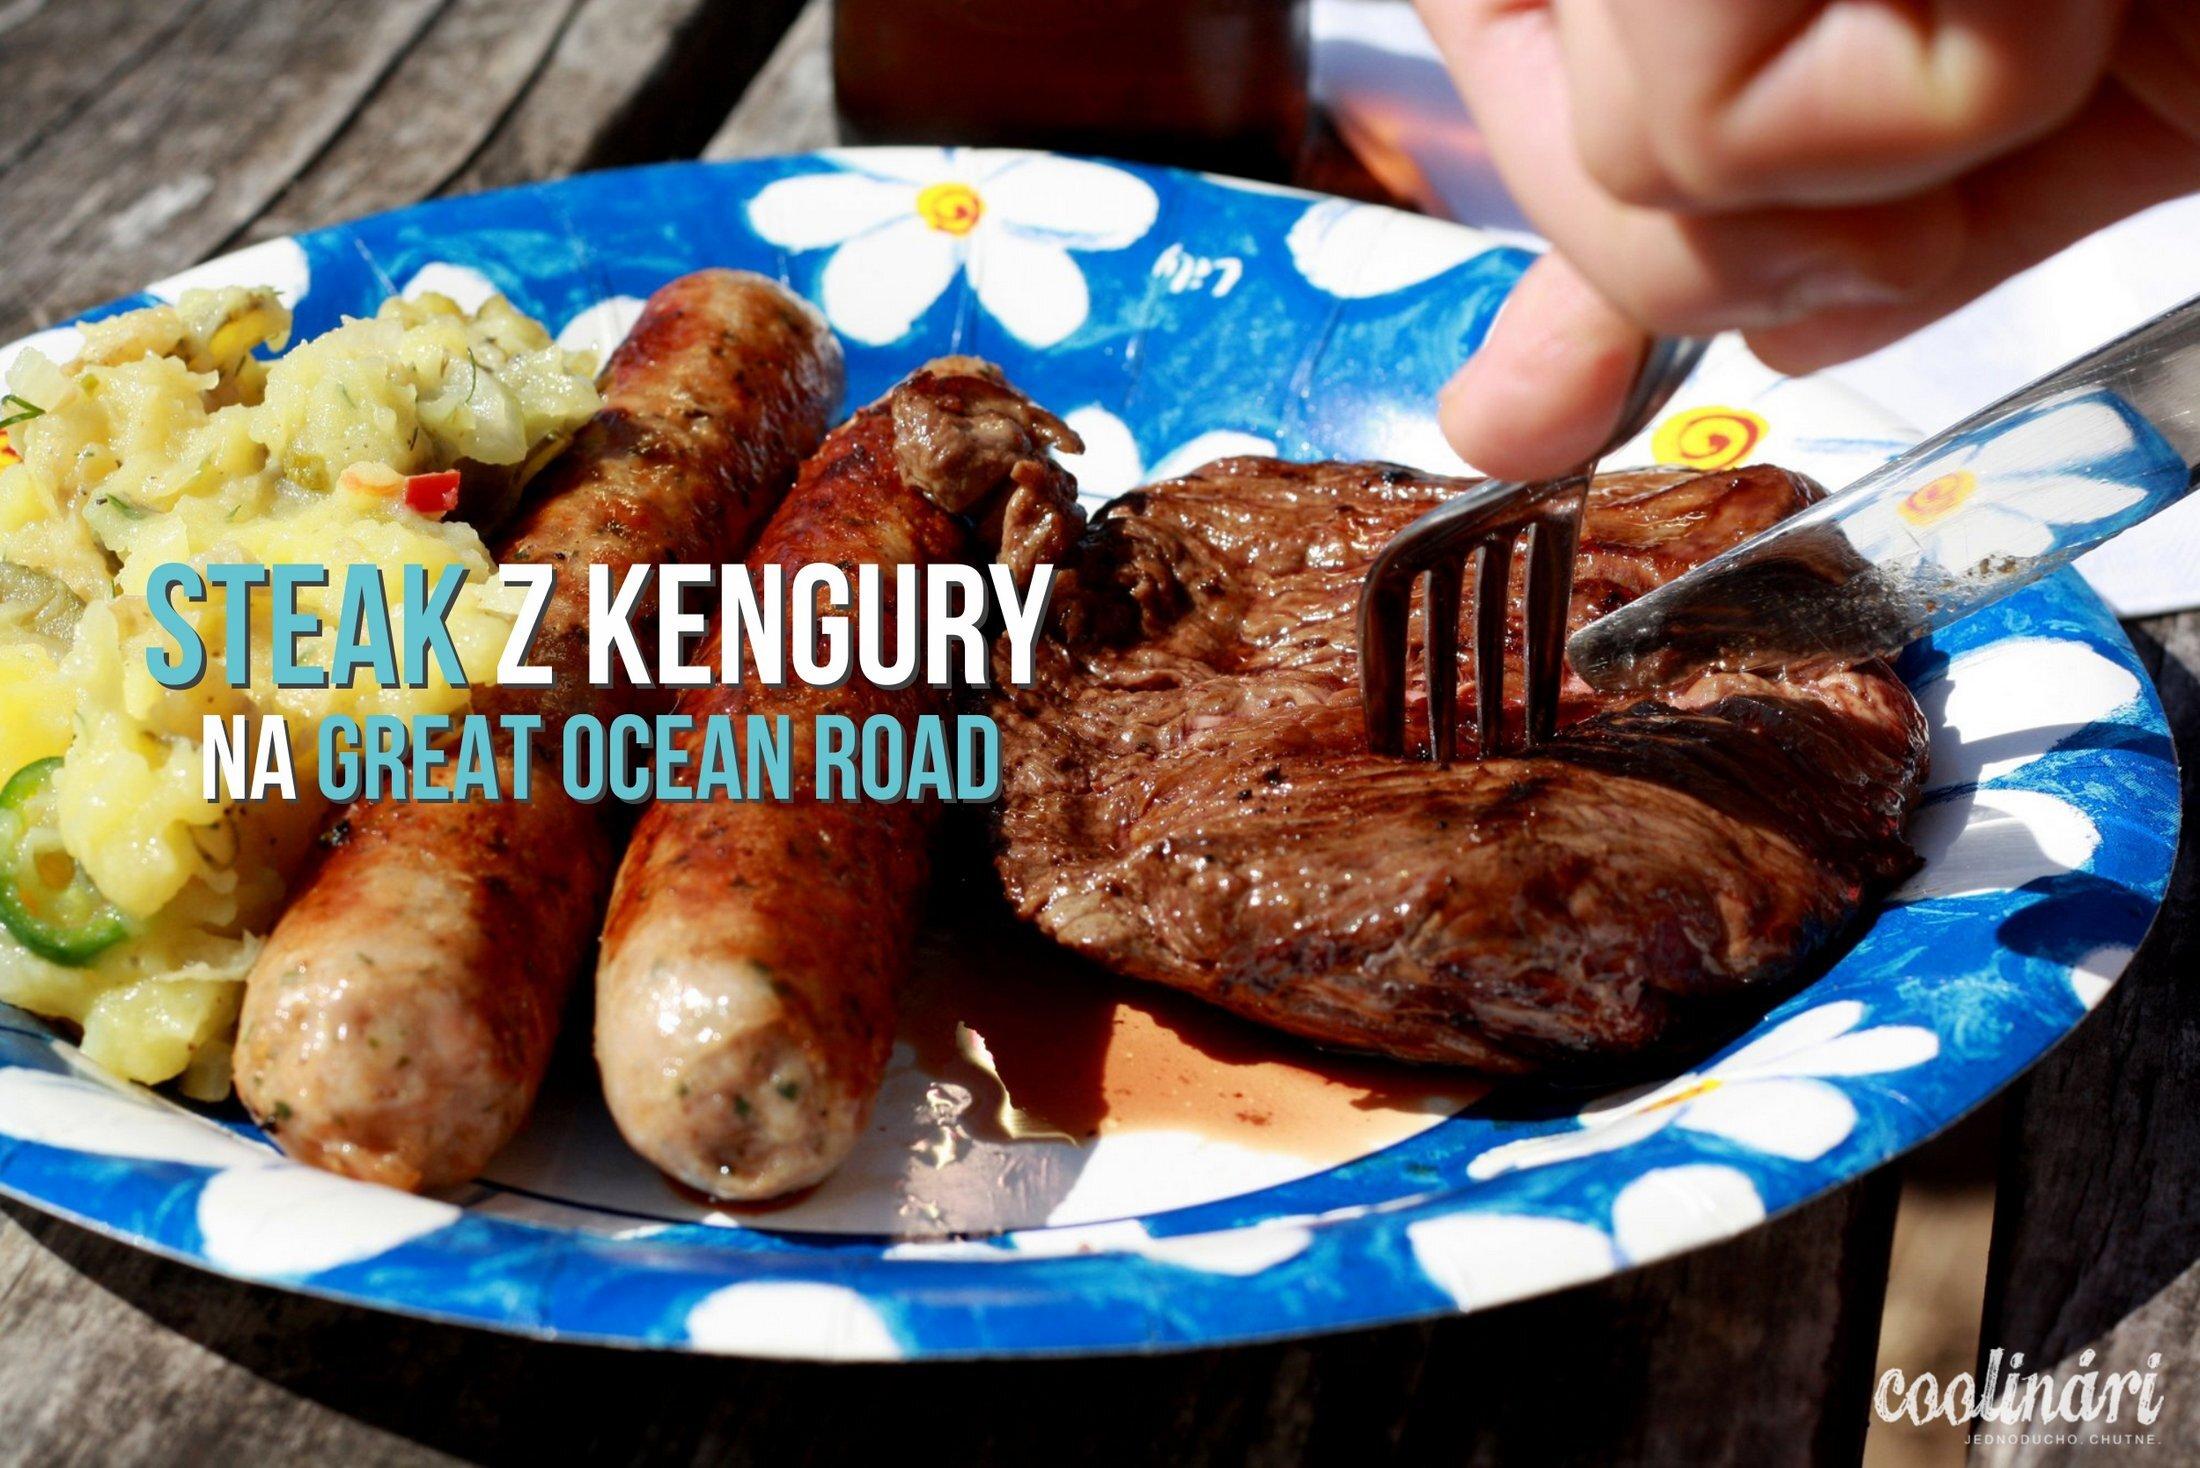 Steak z kengury na Great Ocean Road